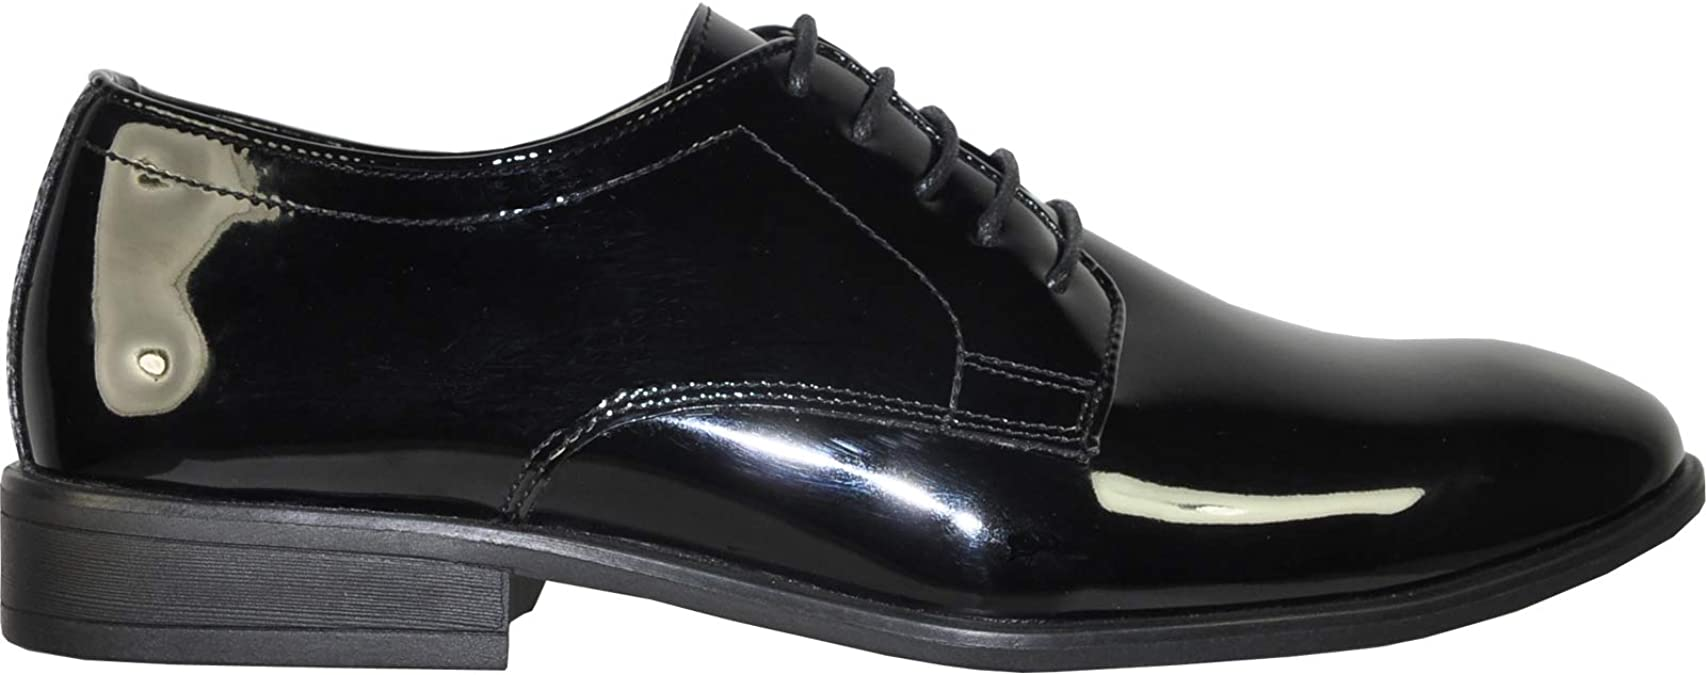 VANGELO Men Oxford Dress Shoe Formal